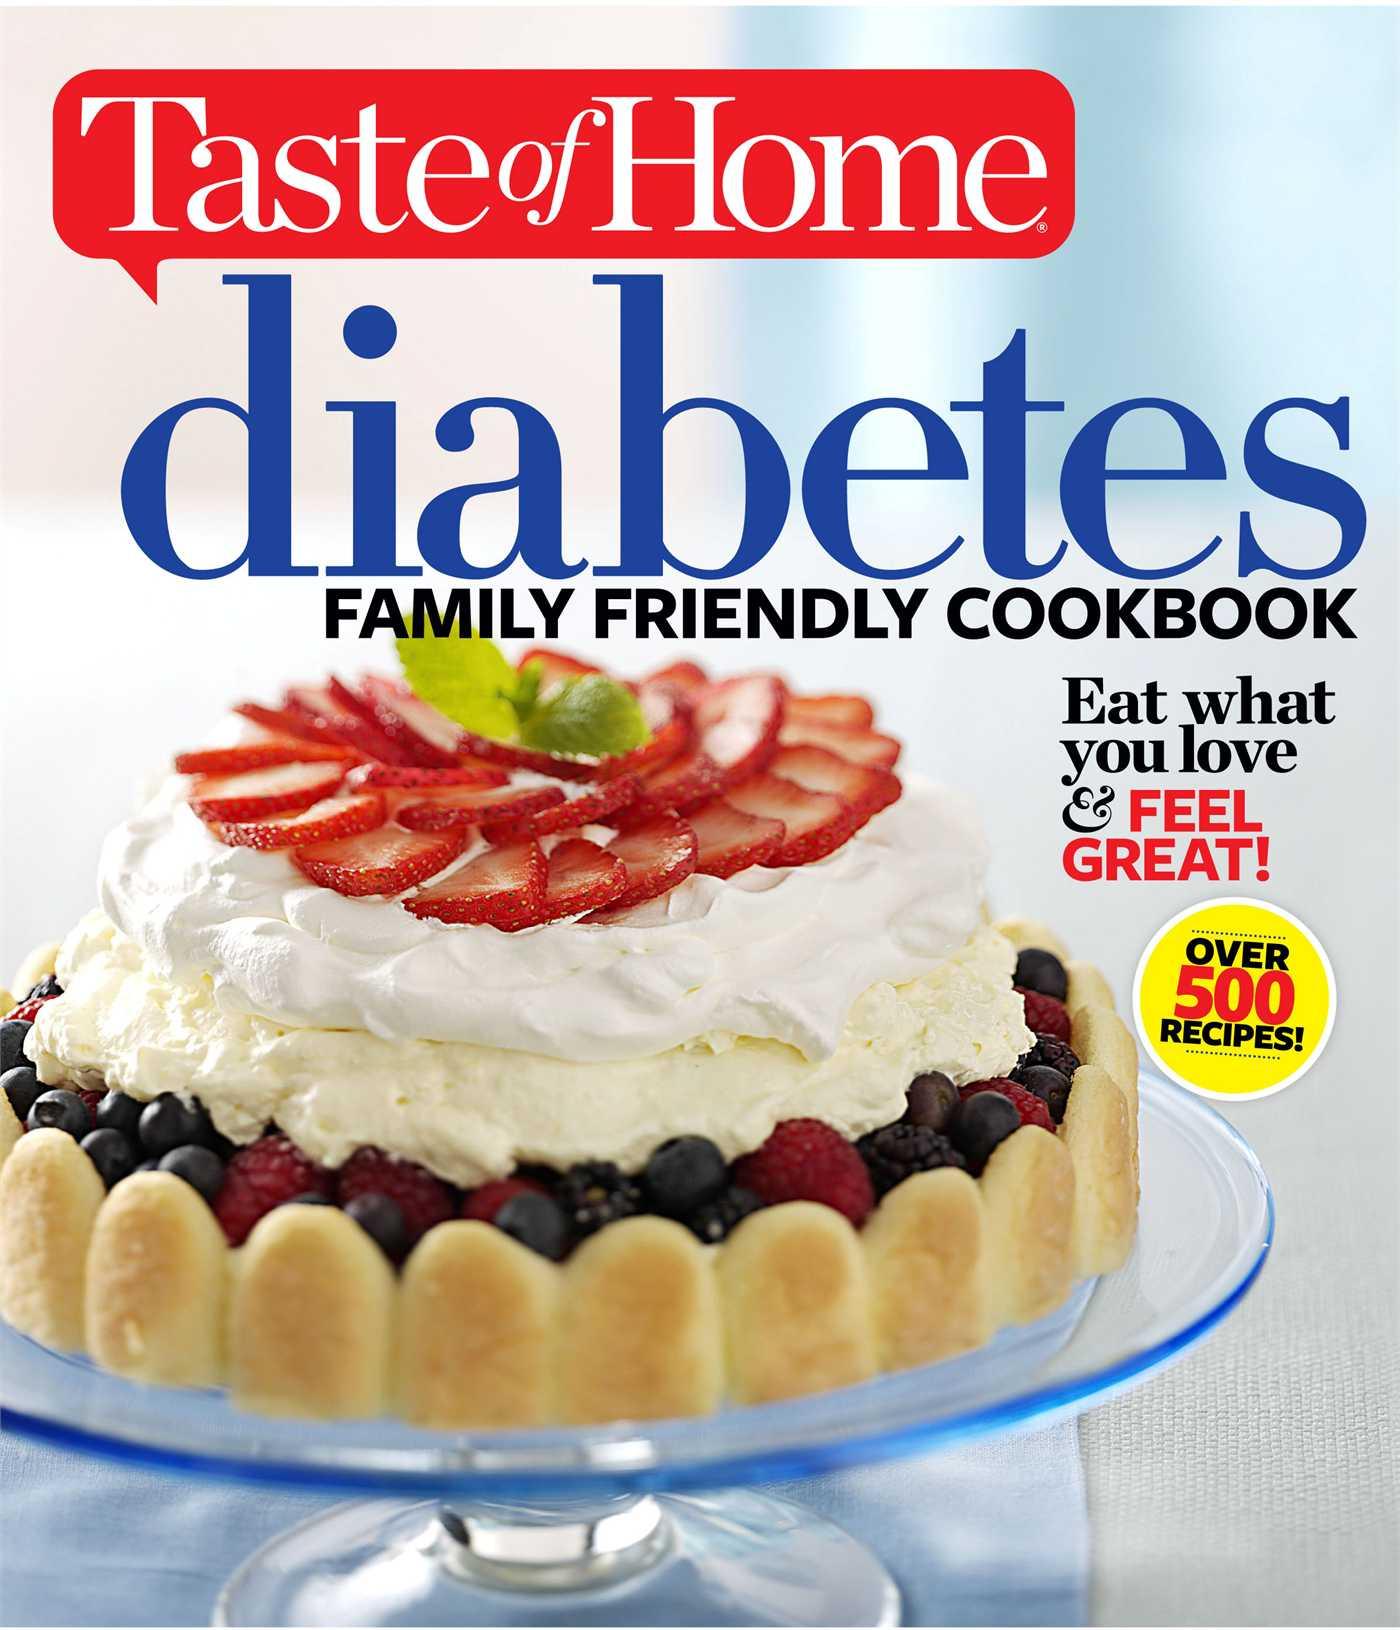 Taste of home diabetes family friendly cookbook 9781617652660 hr